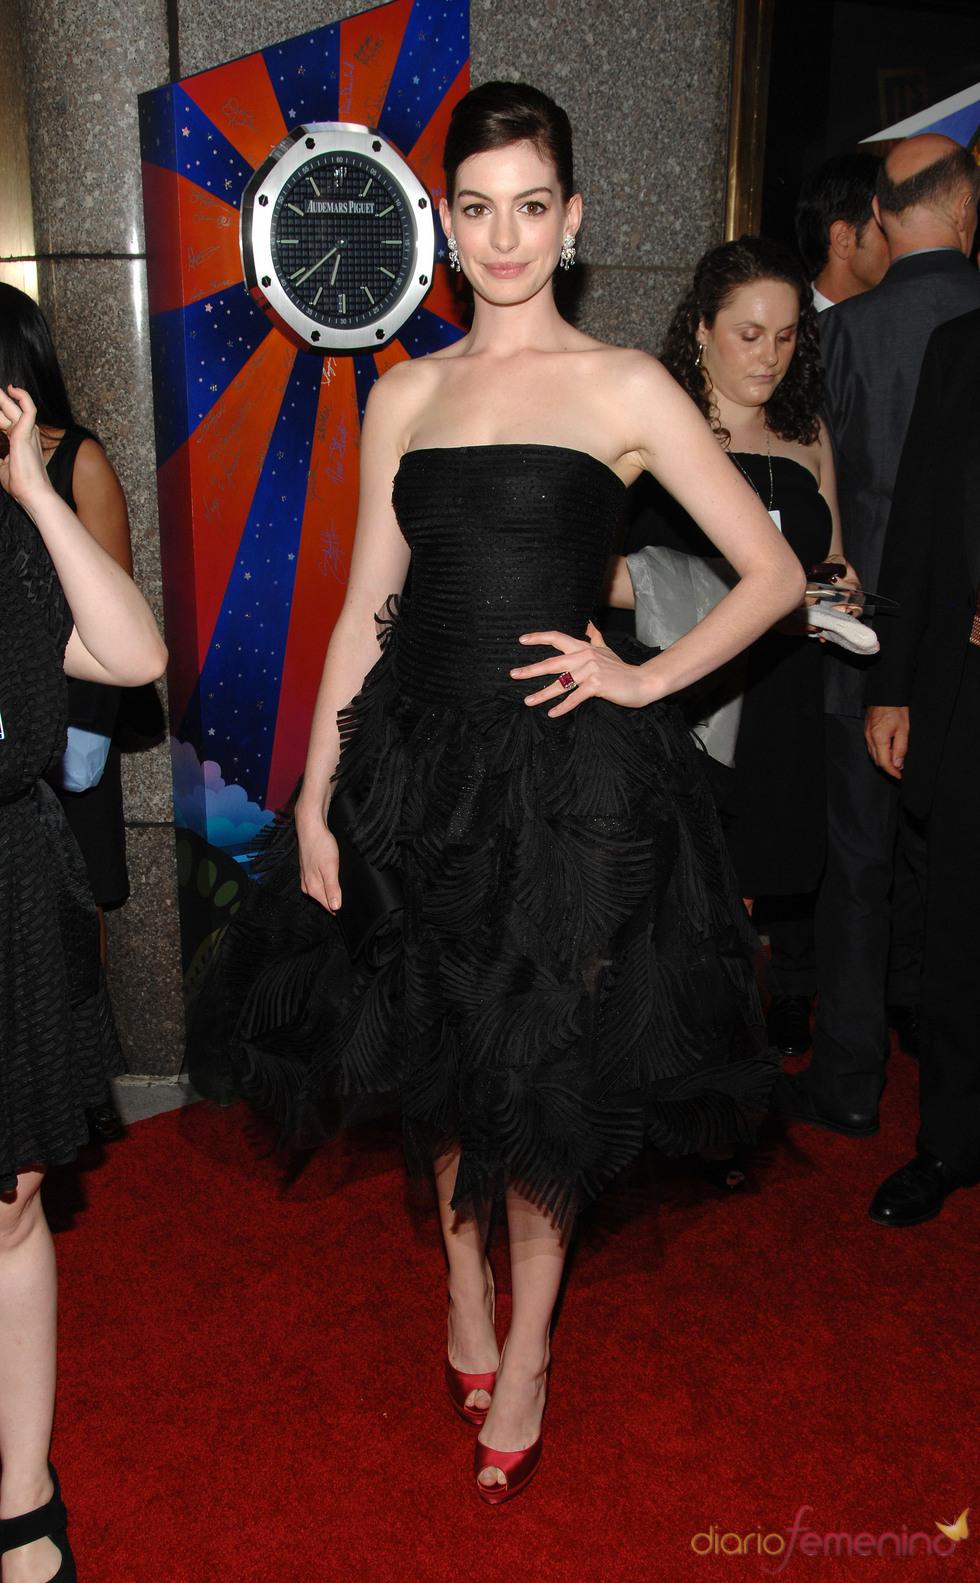 Anne Hathaway en los Annual Tony Awards 2009